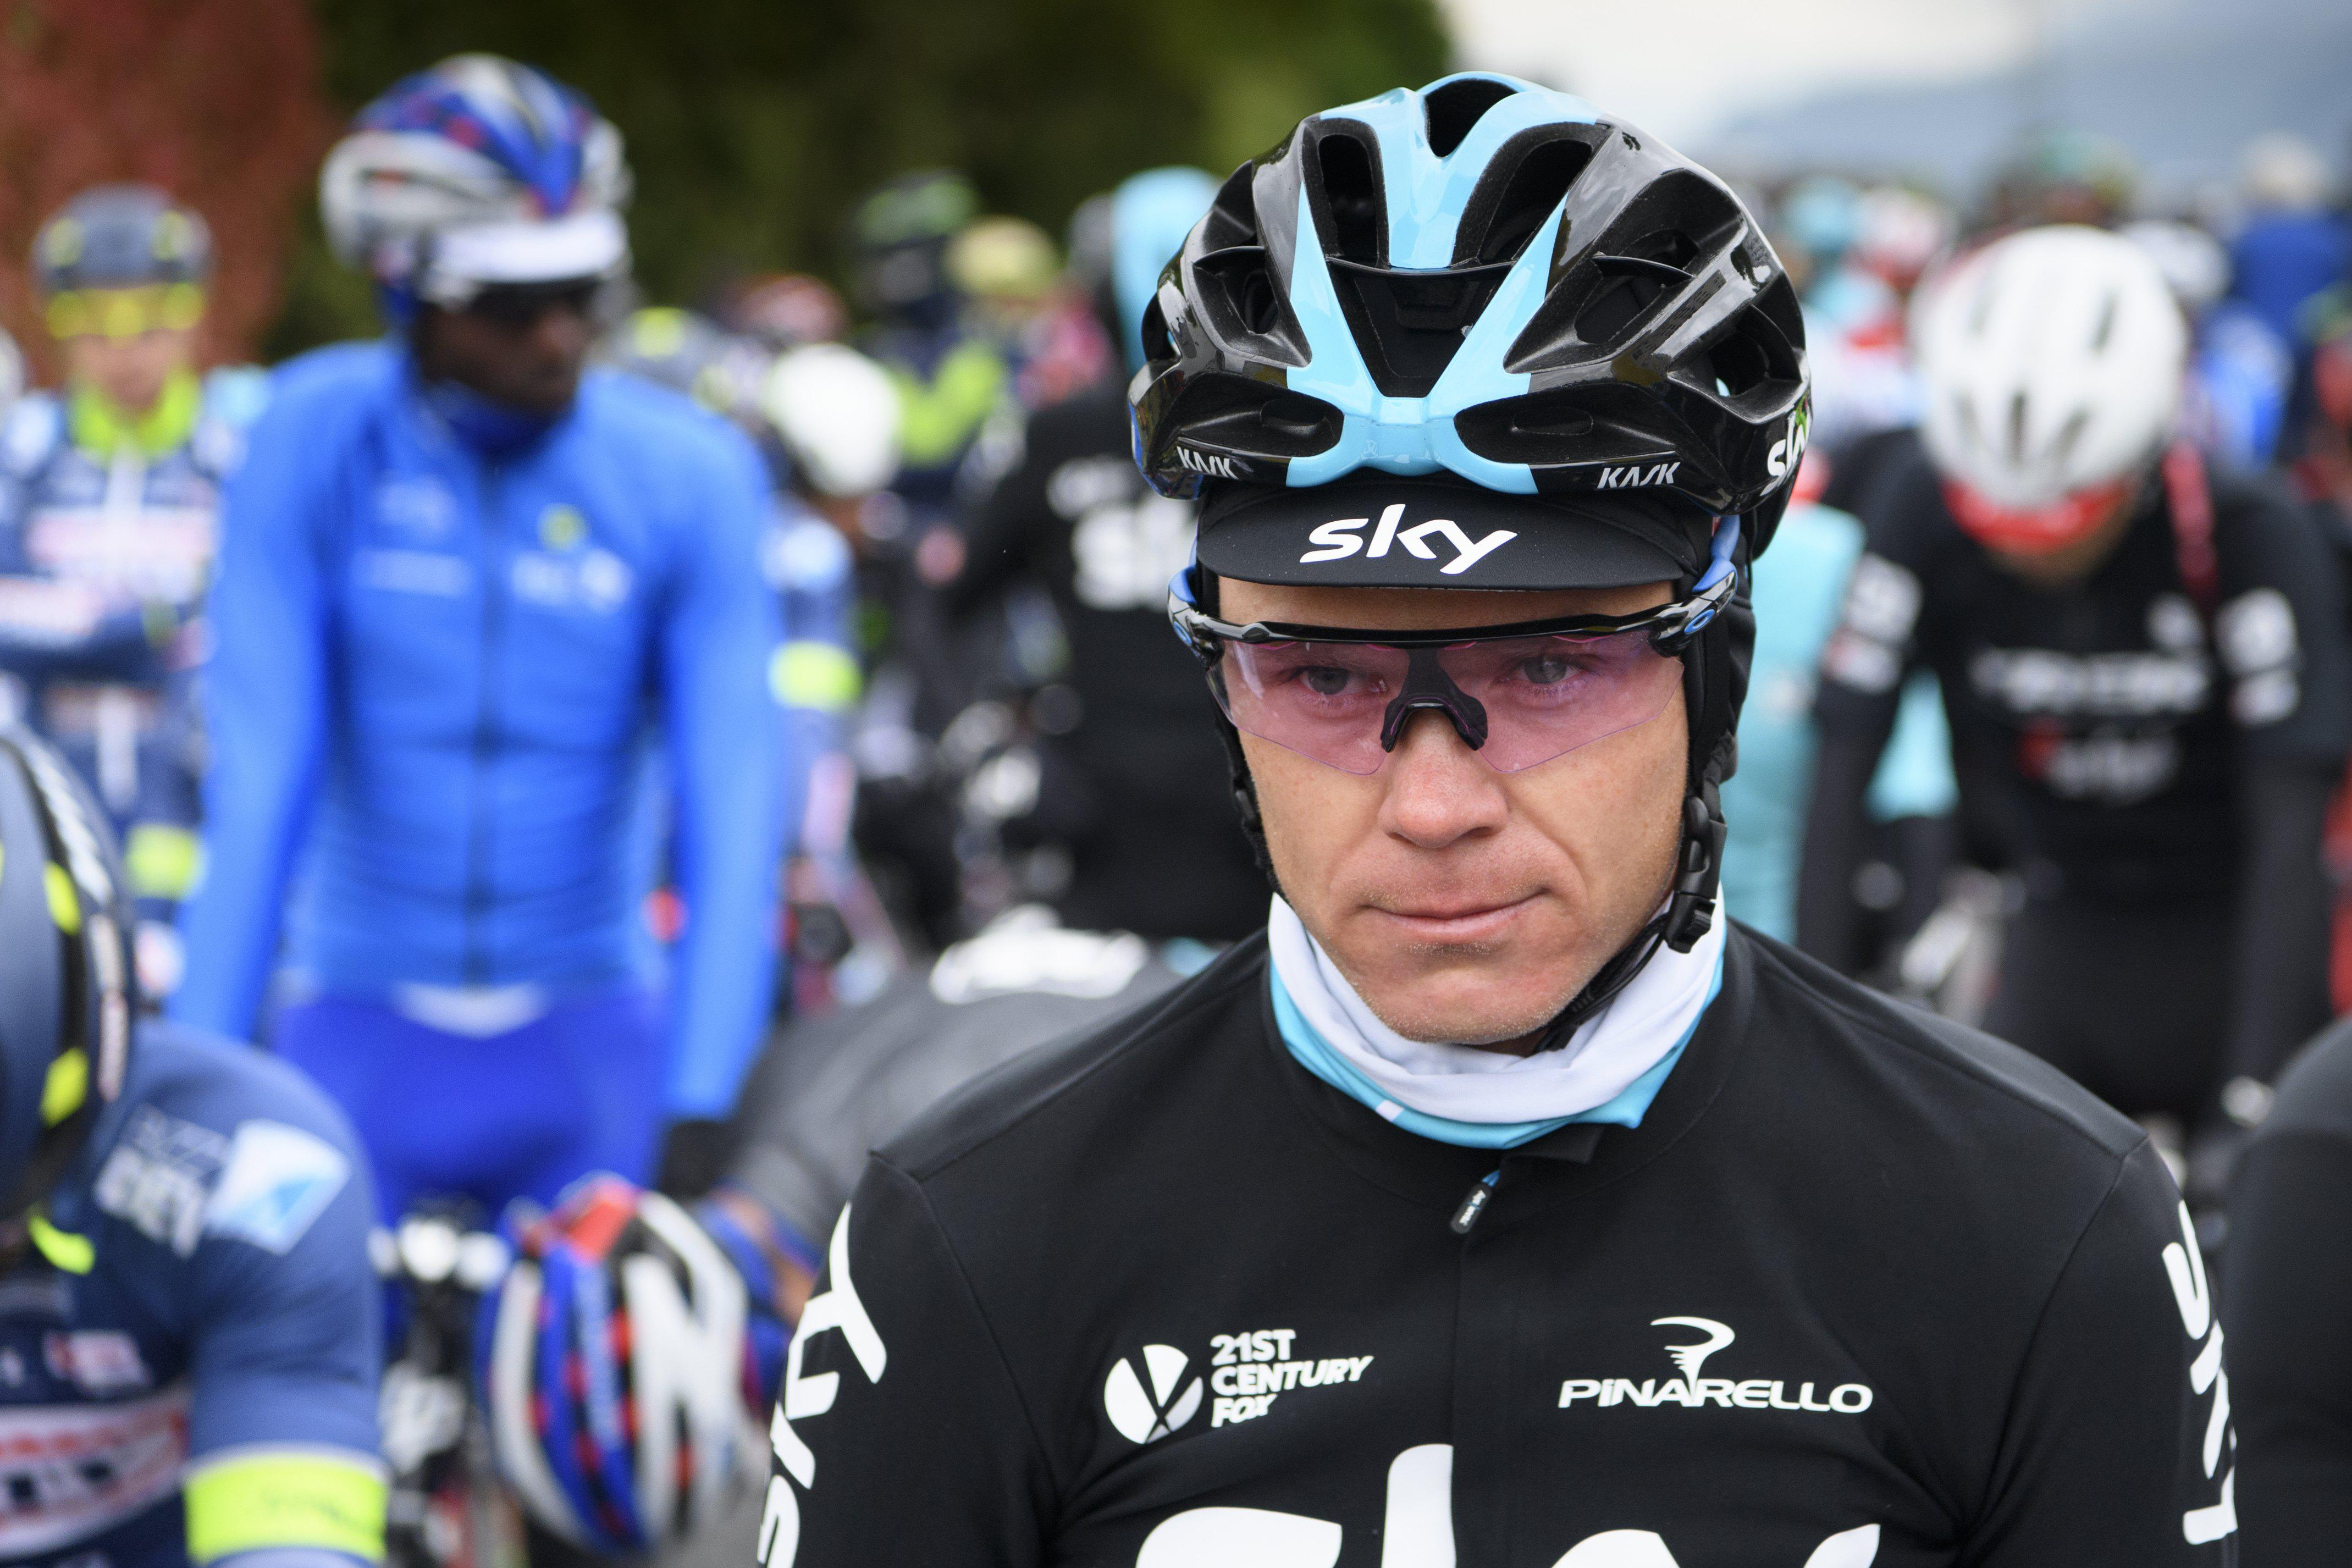 Chris Froome has won three out of the last four Tour de France races